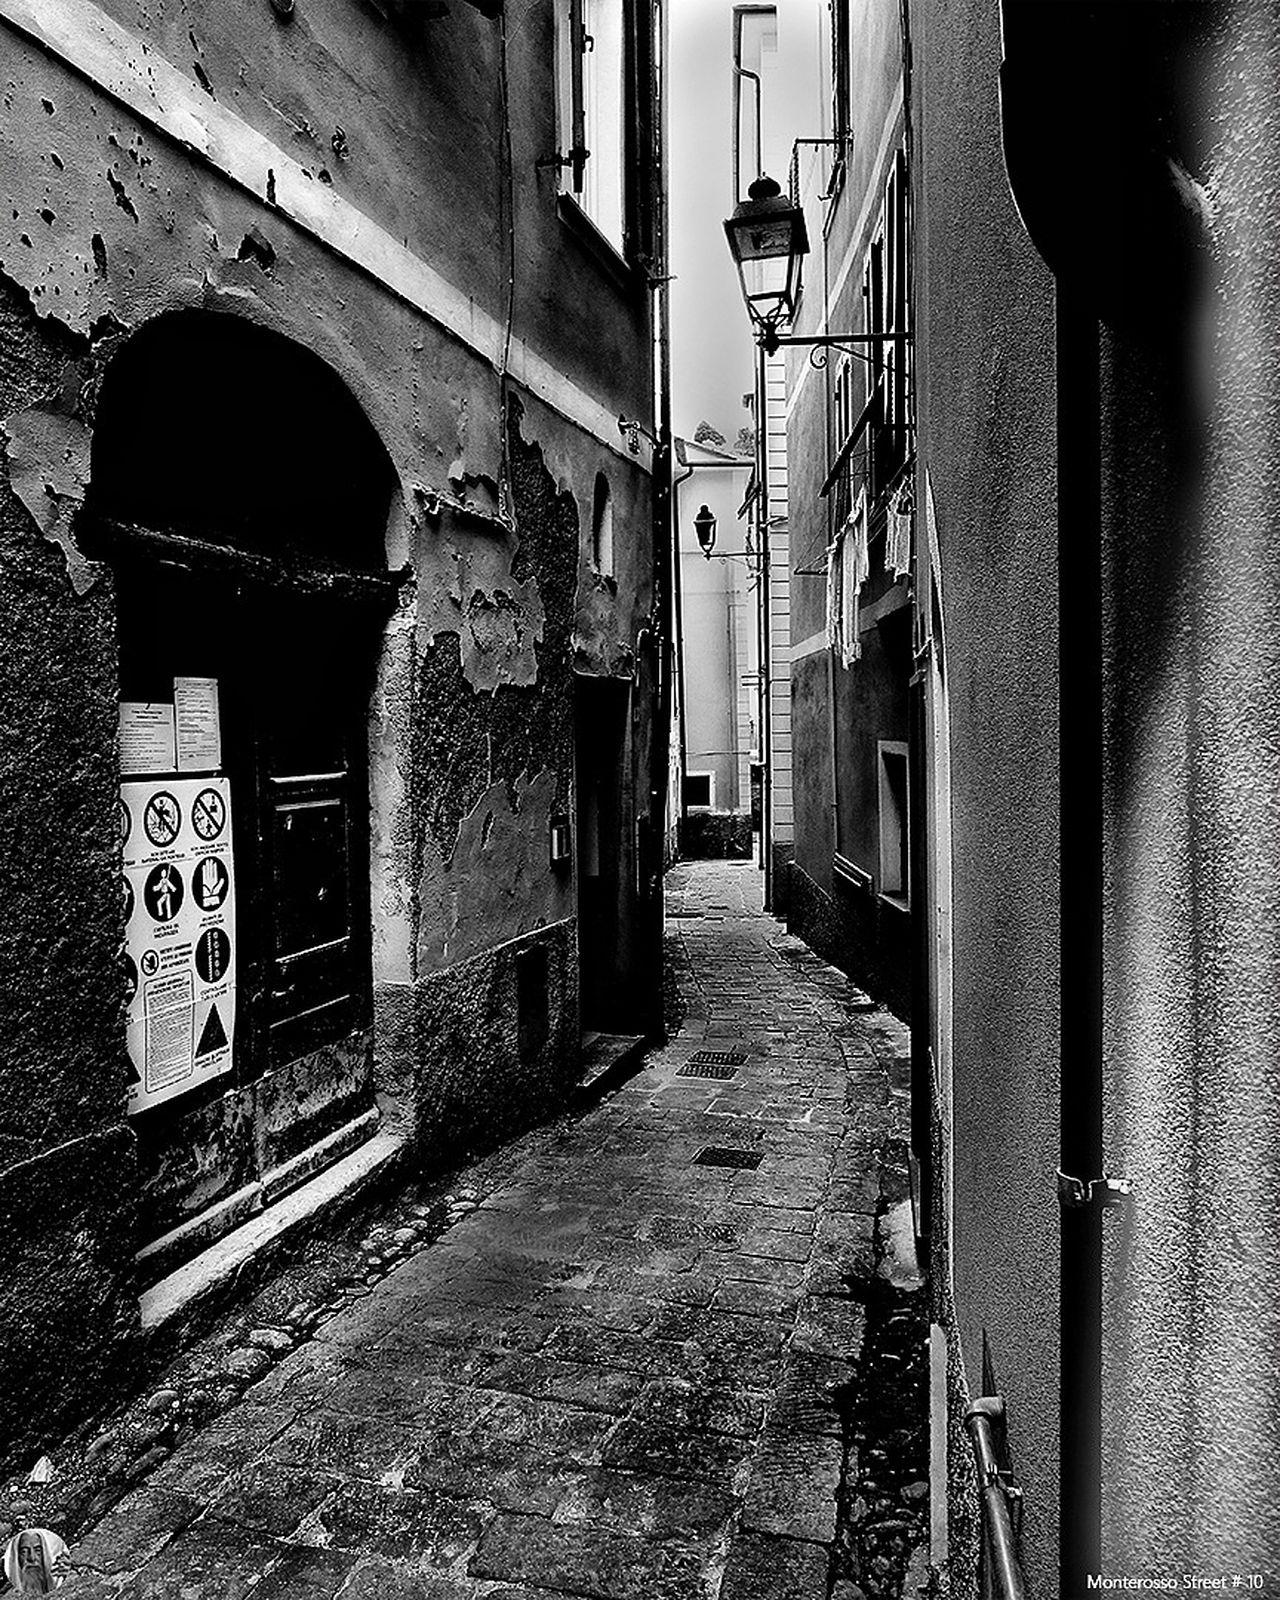 Monterosso Street City No People Blackandwhite EyeEm Best Shots - Black + White Eye4black&white  Bw_collection Black & White Street Streetphotography Streetphoto_bw Old Black And White